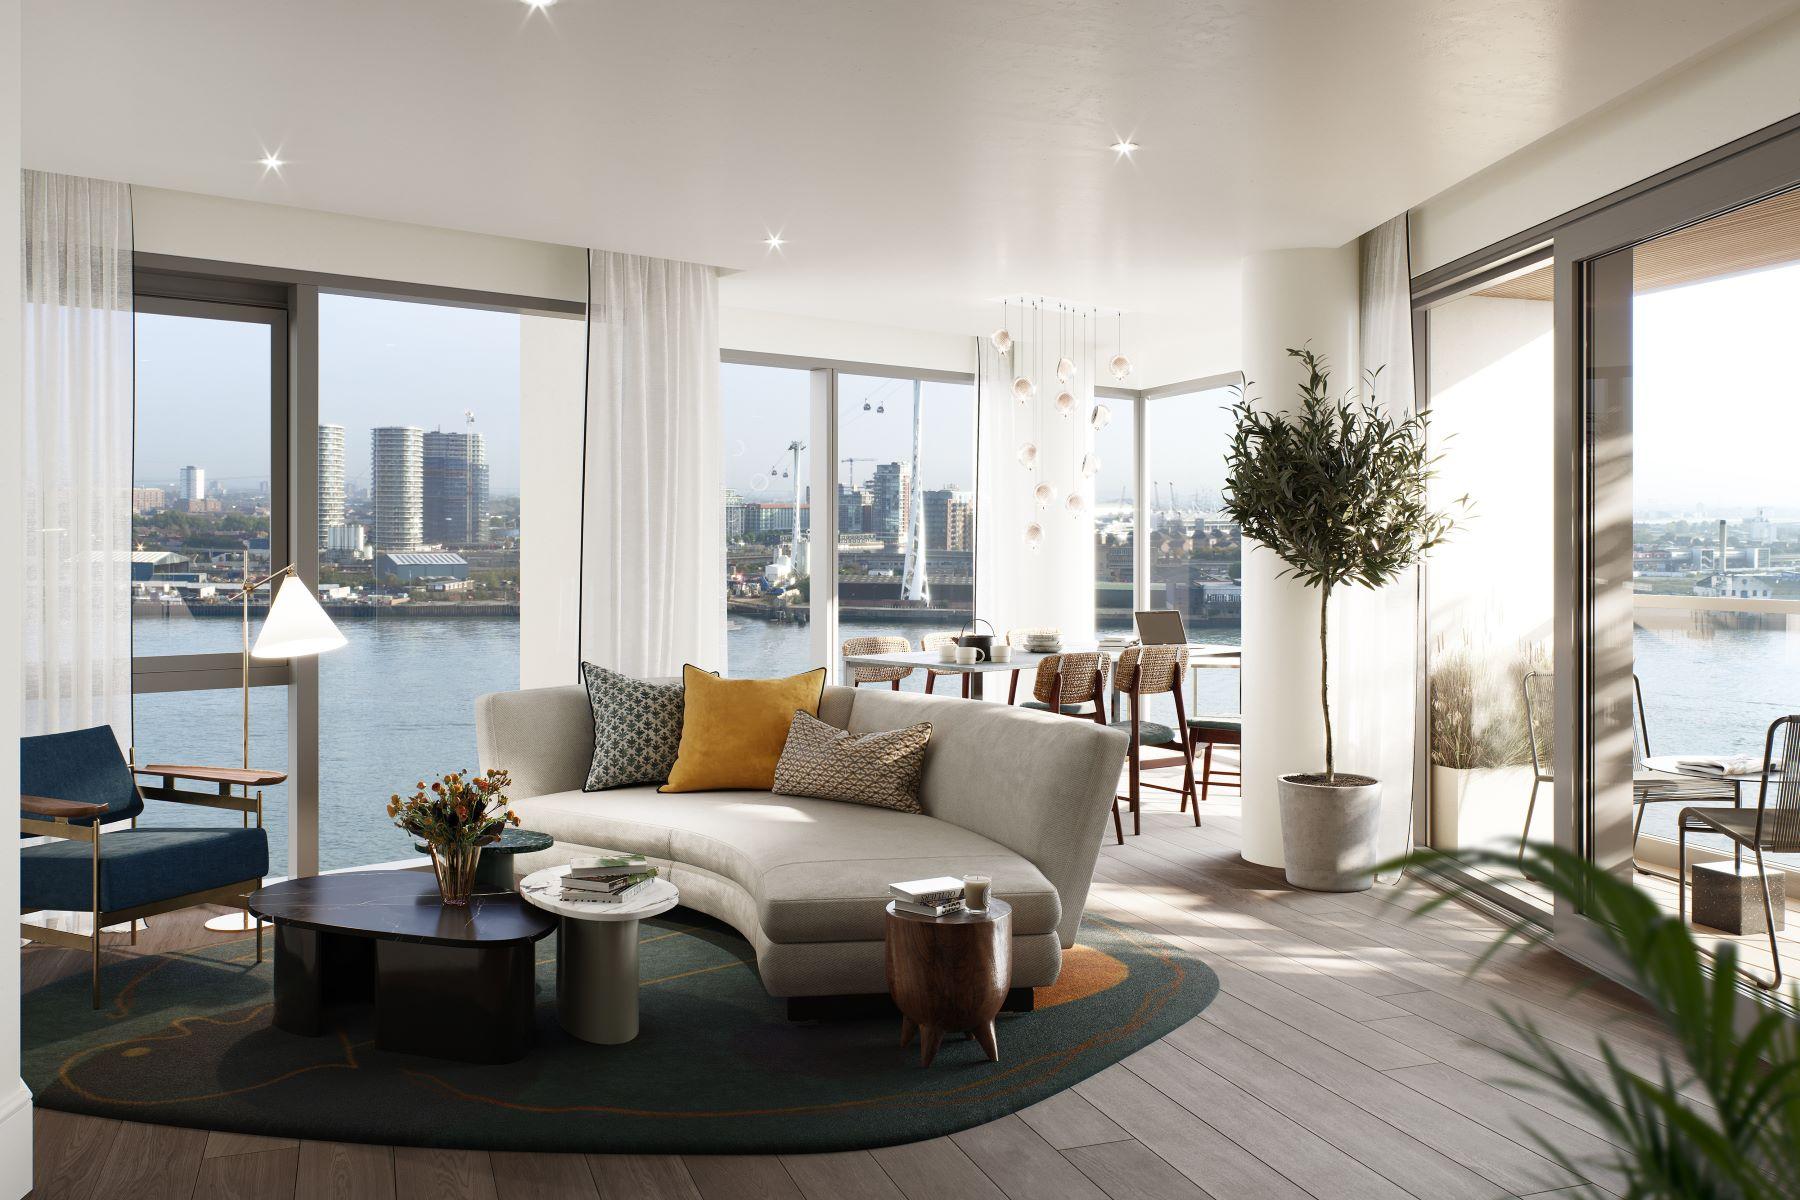 Apartments for Sale at Greenwich Peninsula Building 3 (12.06), Upper Riverside London, England SE10 0SQ United Kingdom